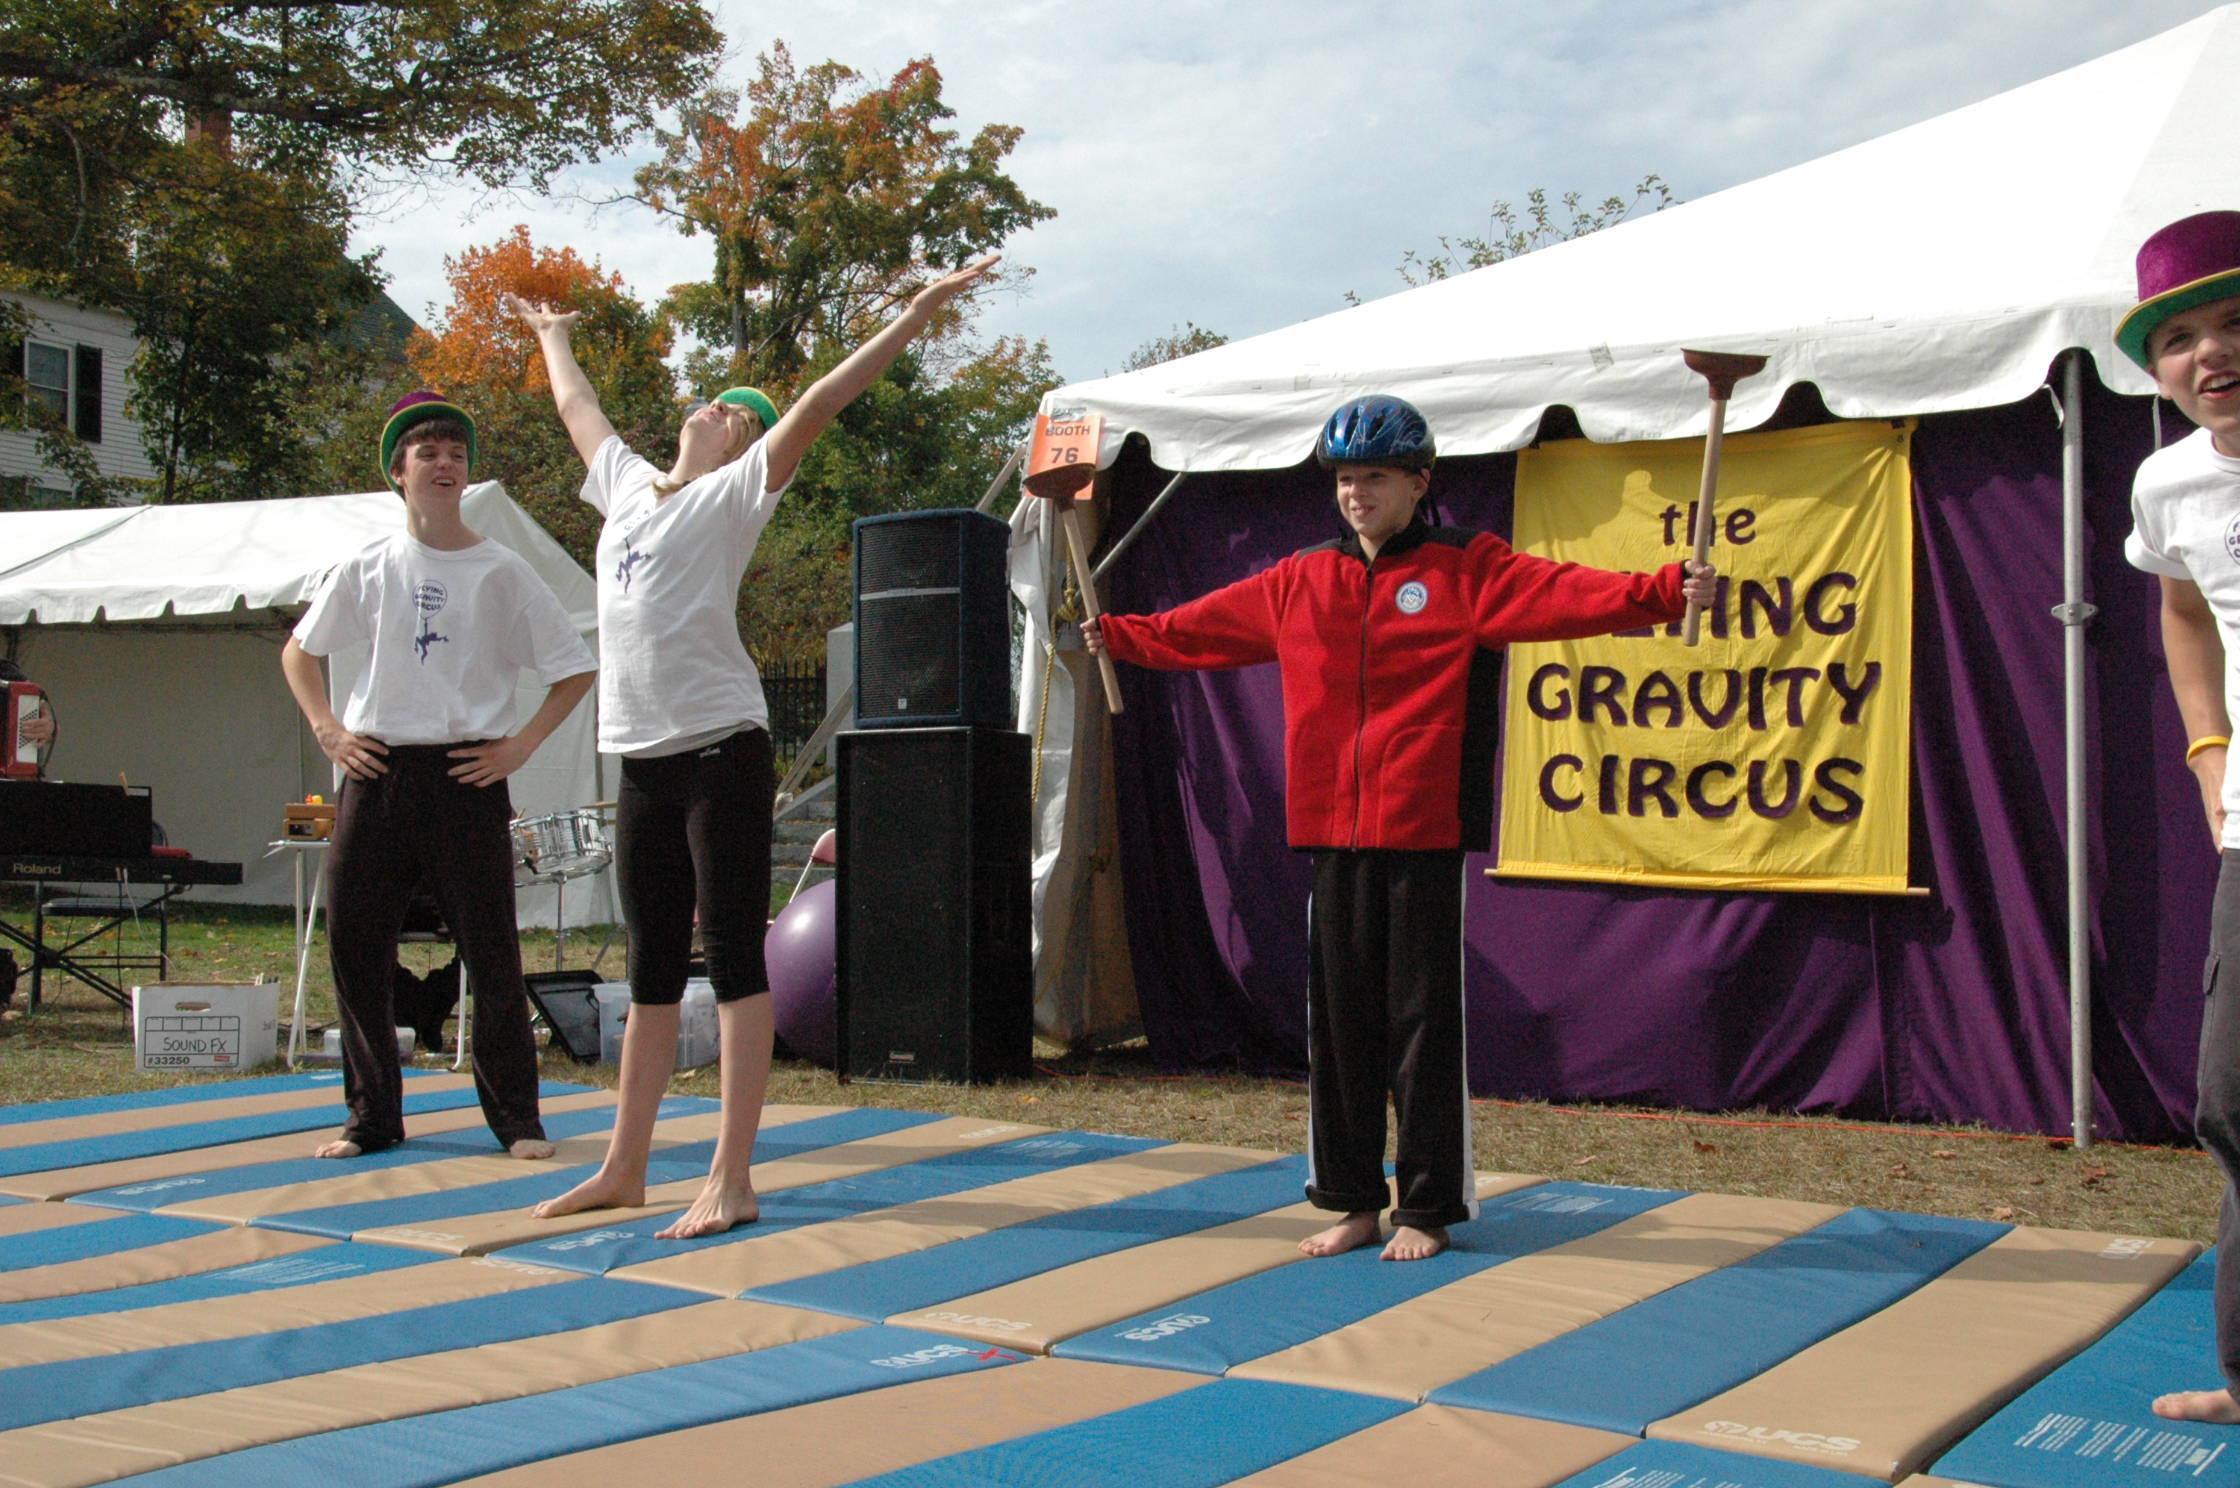 2012-10-06 Flyin Gravity Circus - Pumpkin 033.JPG